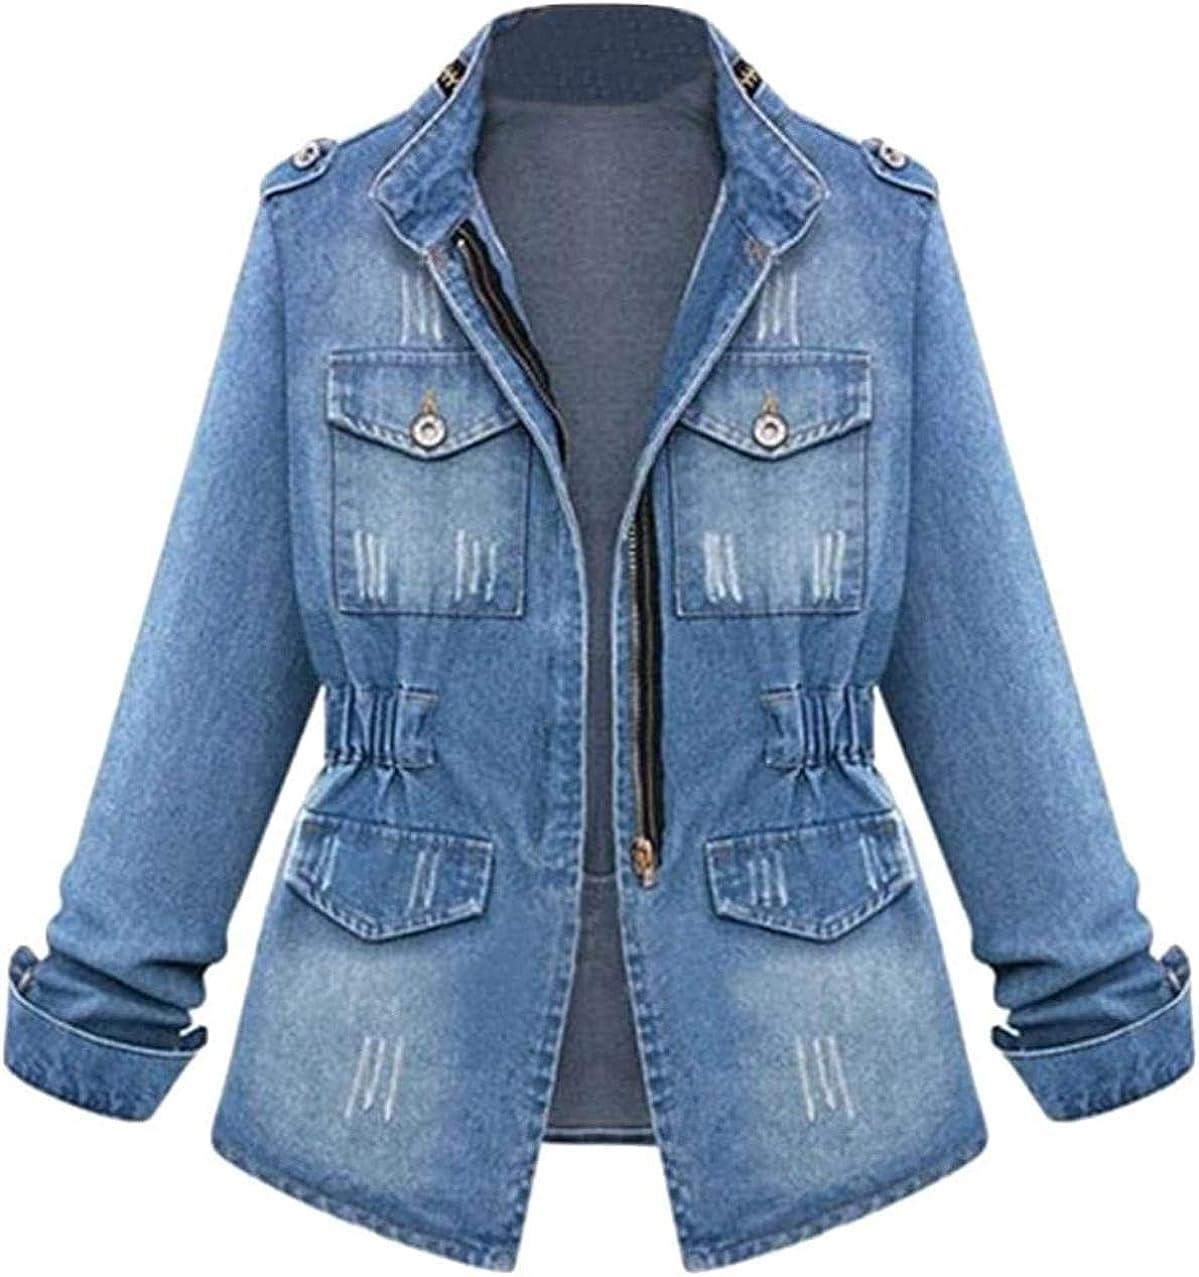 Jean Jacket for Women denim Distressed Corset Jean Coat Basic Long Sleeves Zipper Fitted Casual Denim Jackets-